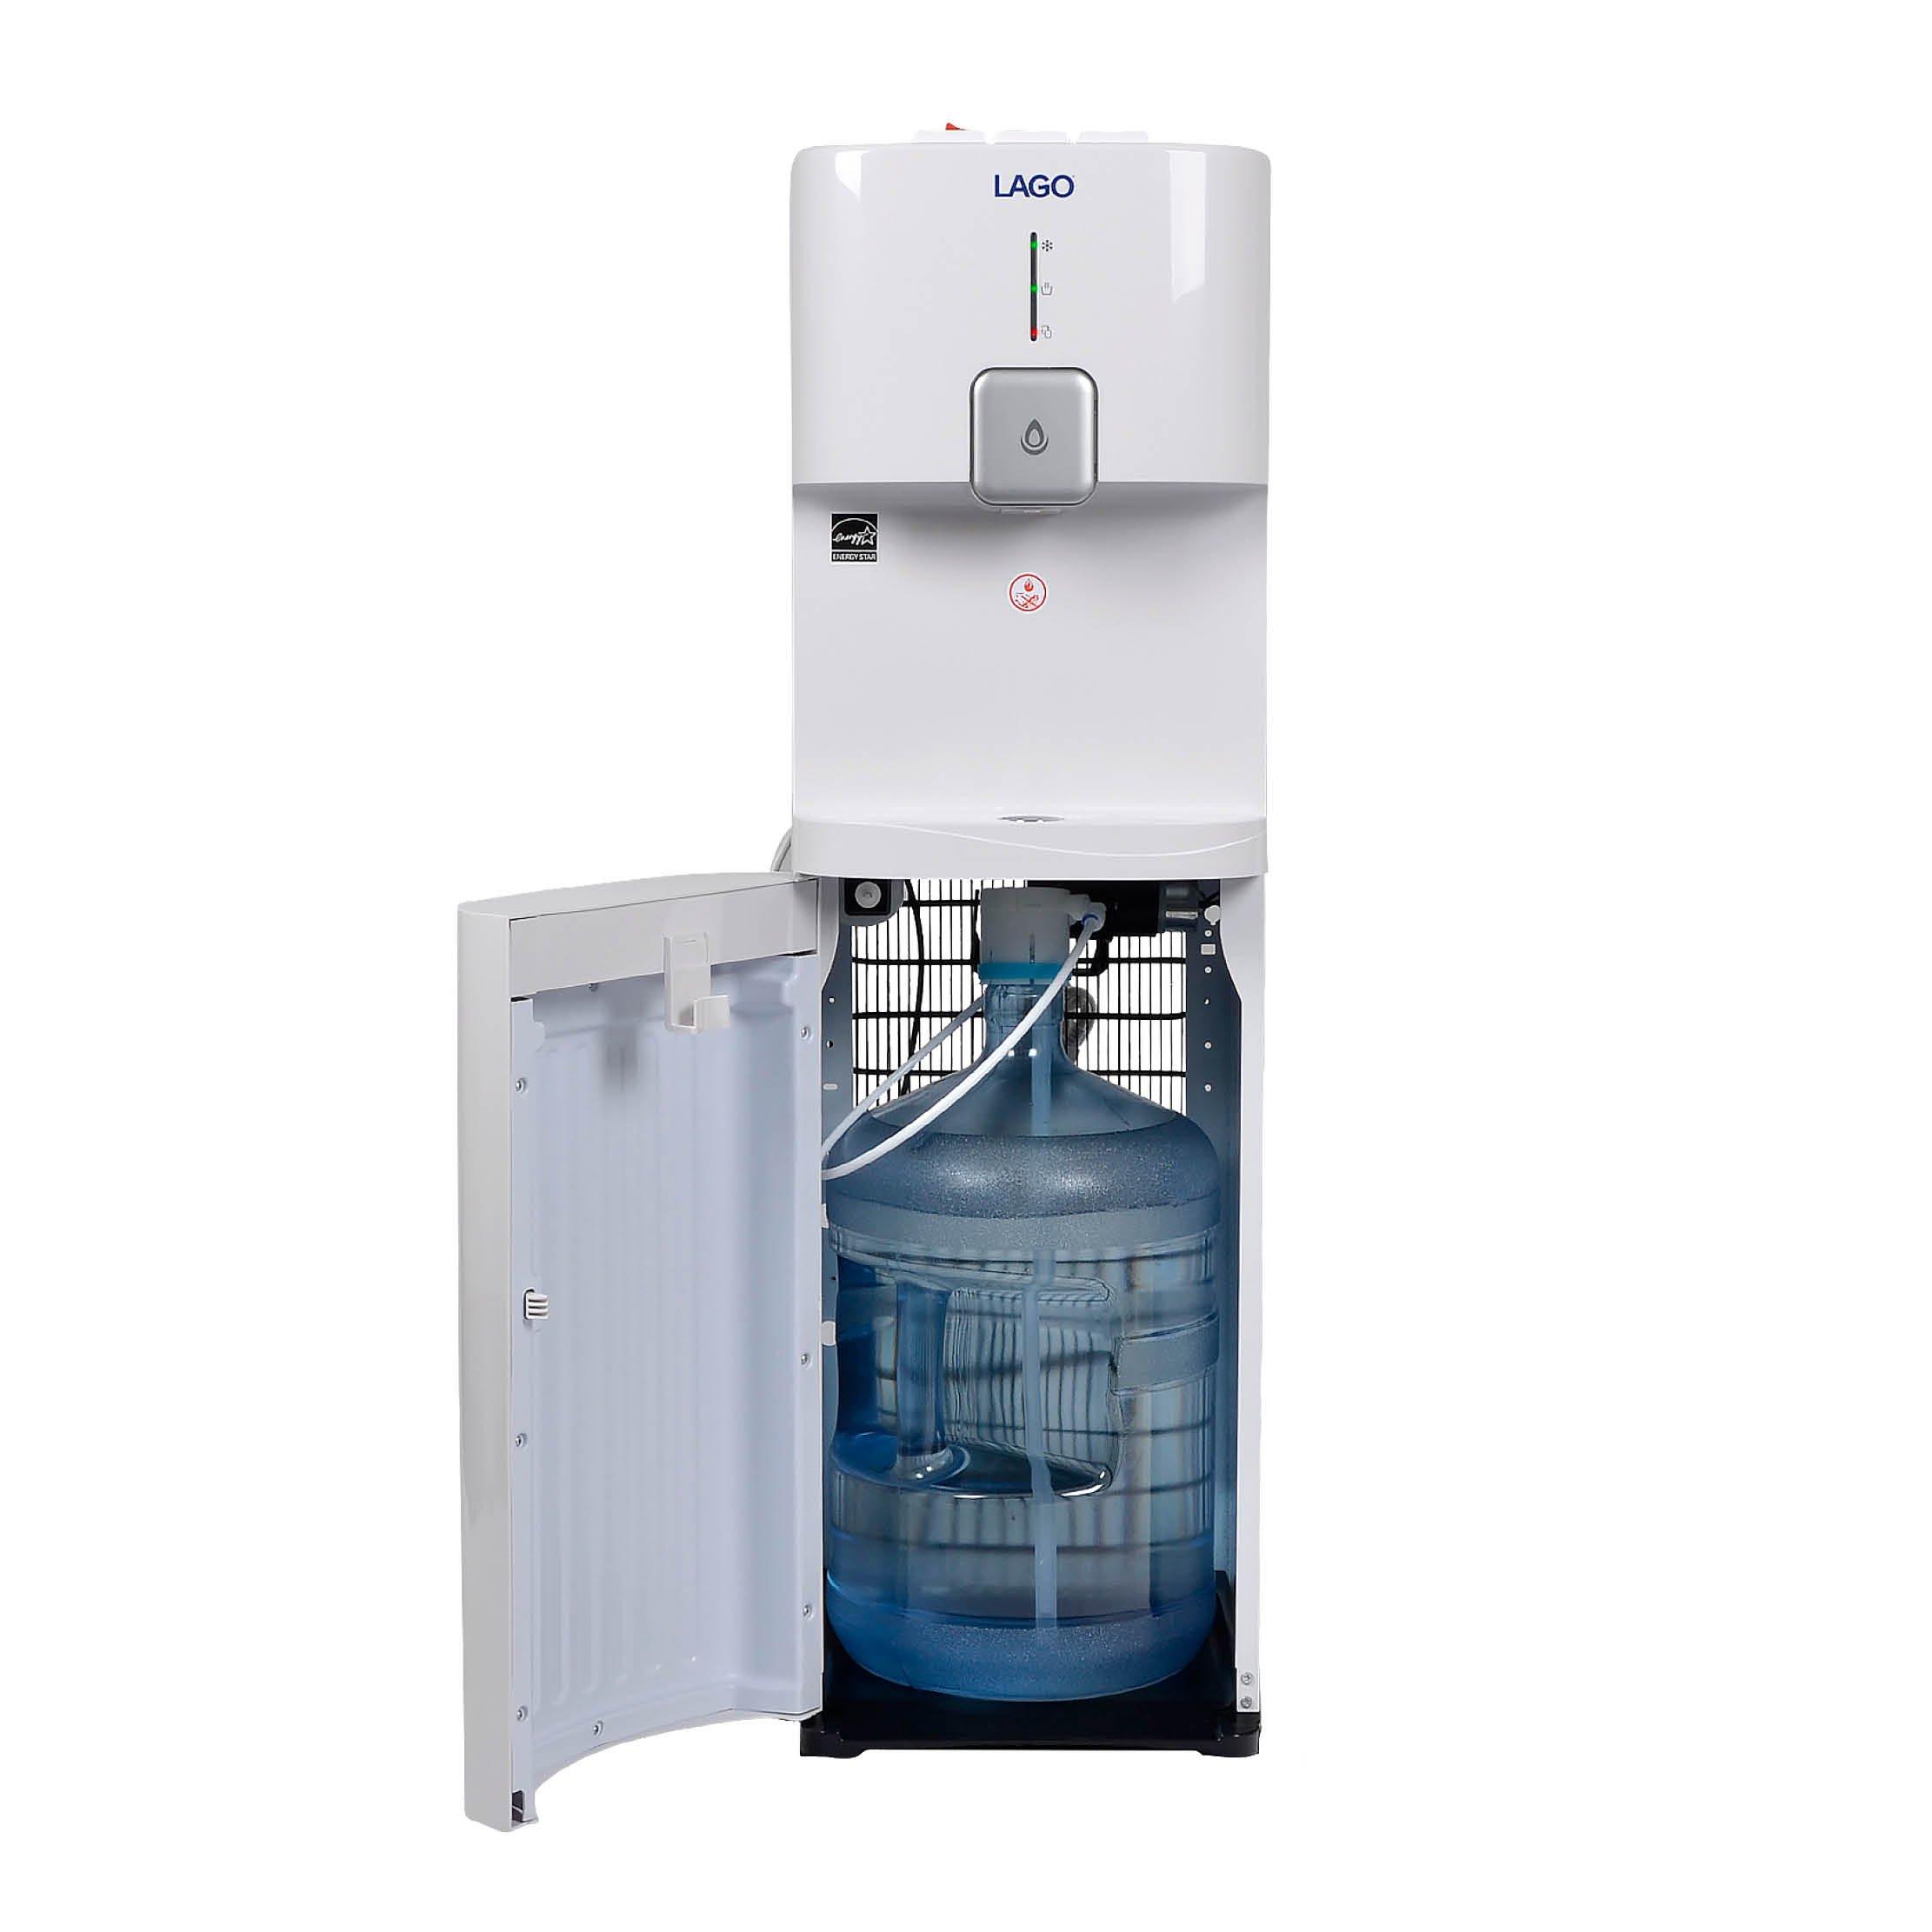 Lago CLBL200 Bottom Load Hot, Cold & Room White Water Cooler Dispenser